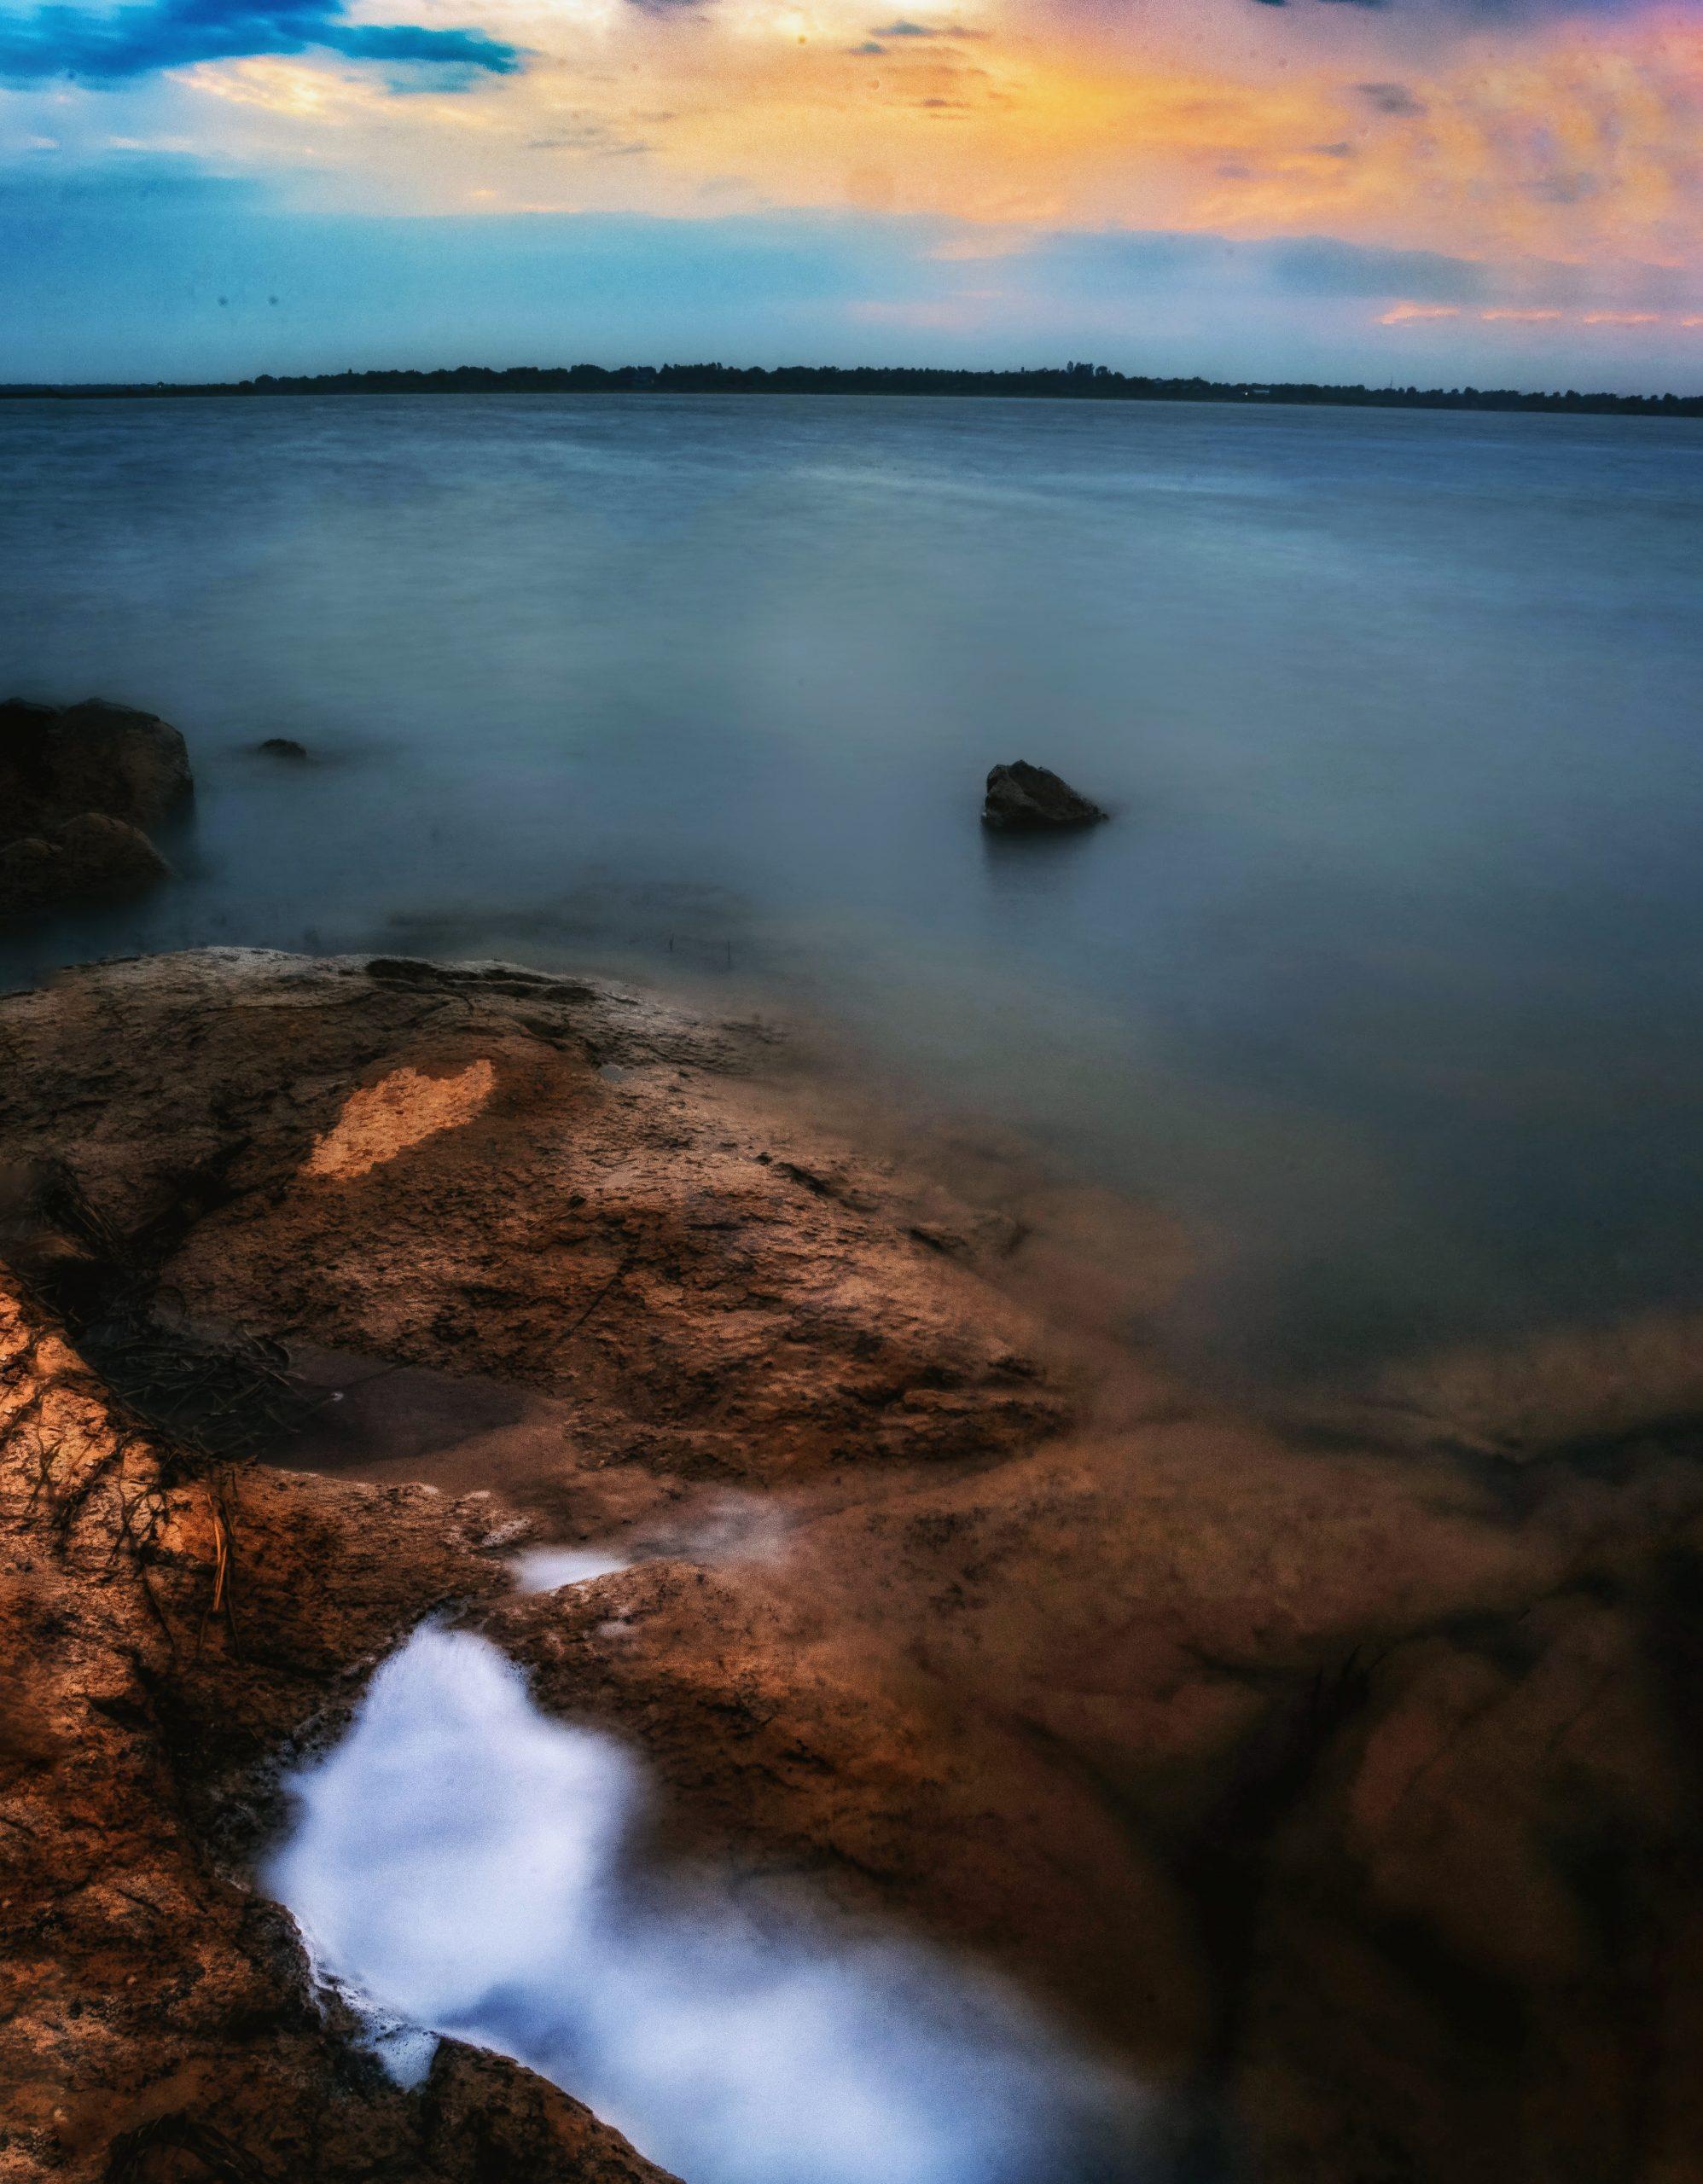 Top Things To Do At The Osman Sagar Lake-Take a Leisure Stroll Around The Lake